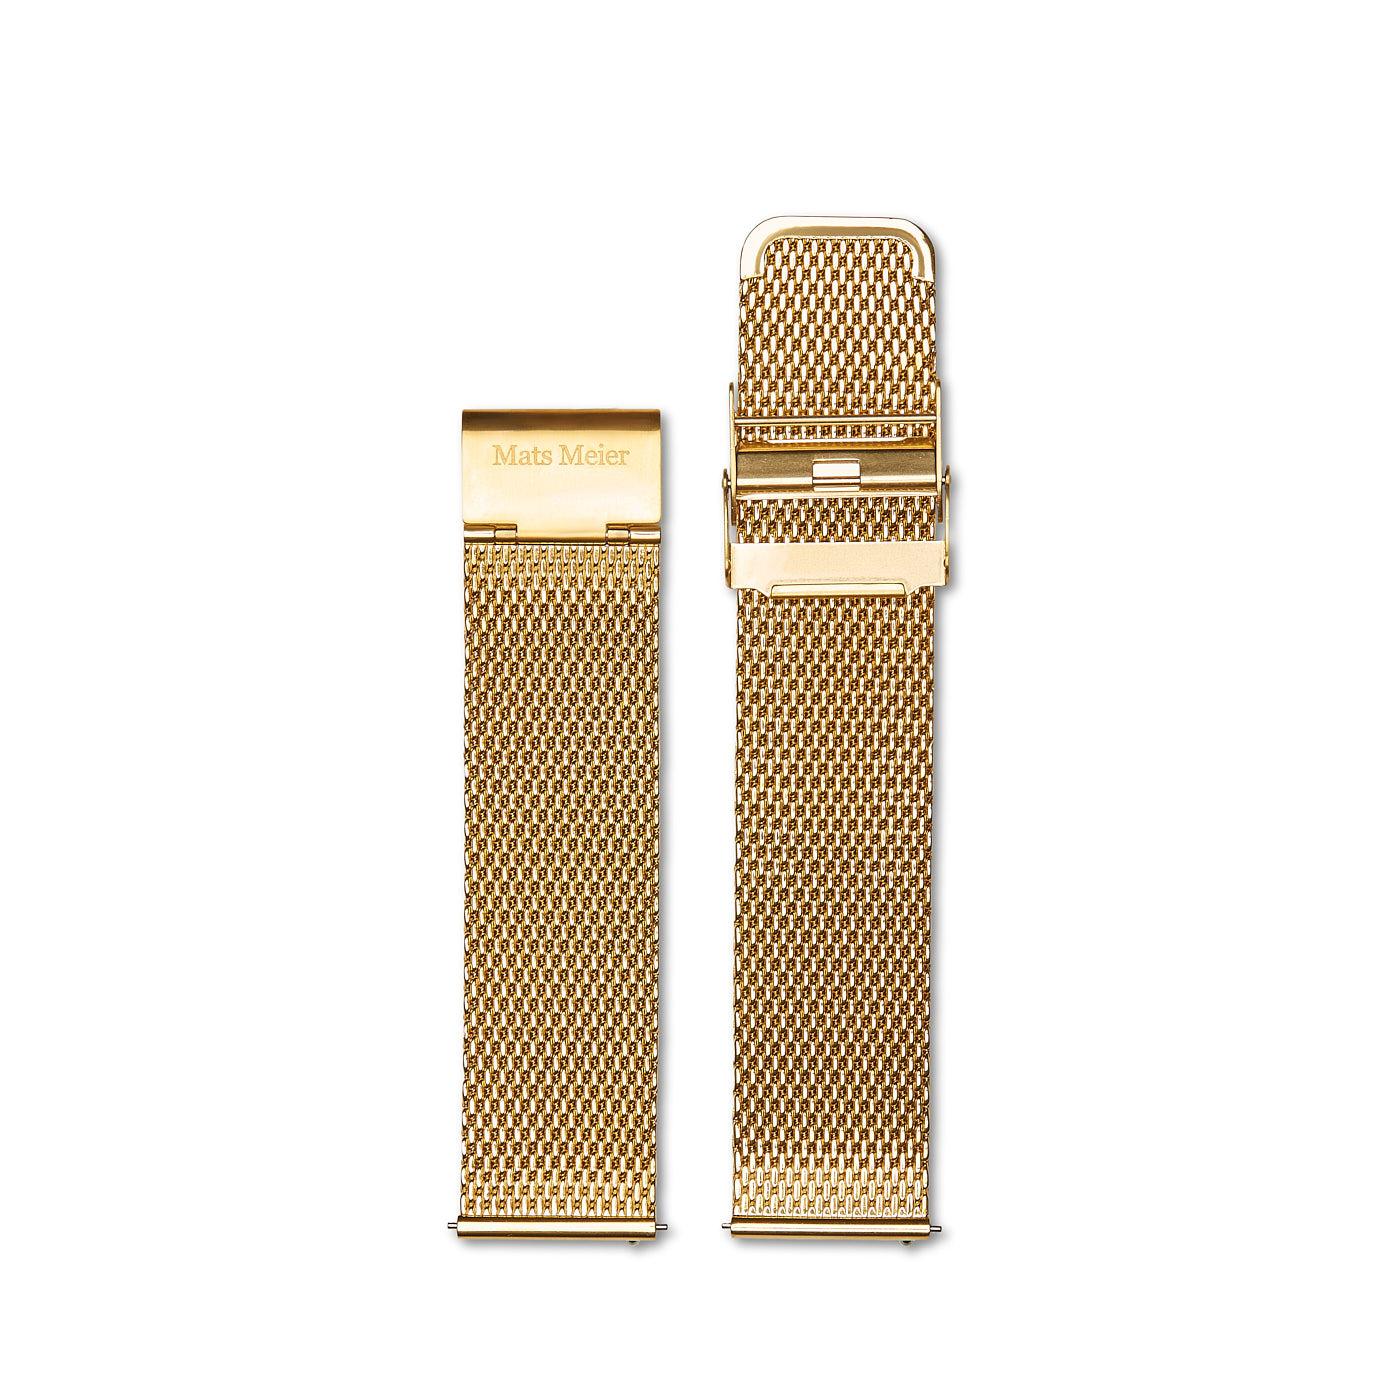 Mats Meier horlogeband 22 mm goudkleurig